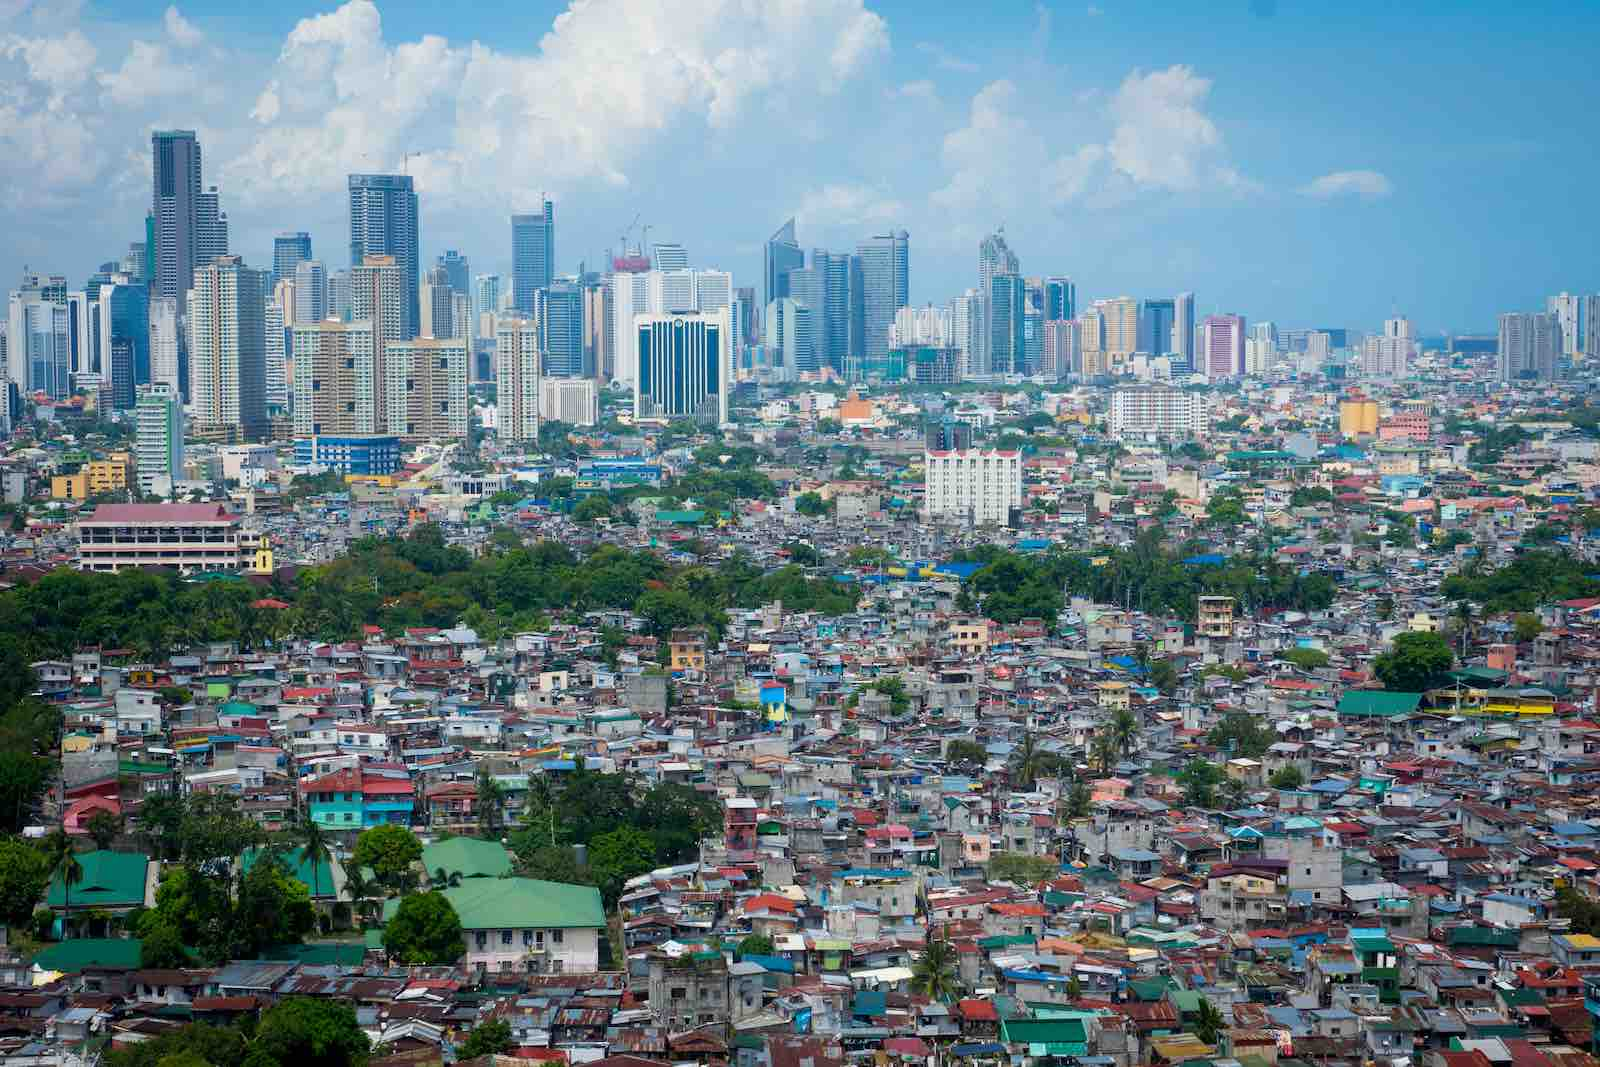 Manila, Philippines (Pavel Sinitcyn/Getty Images)